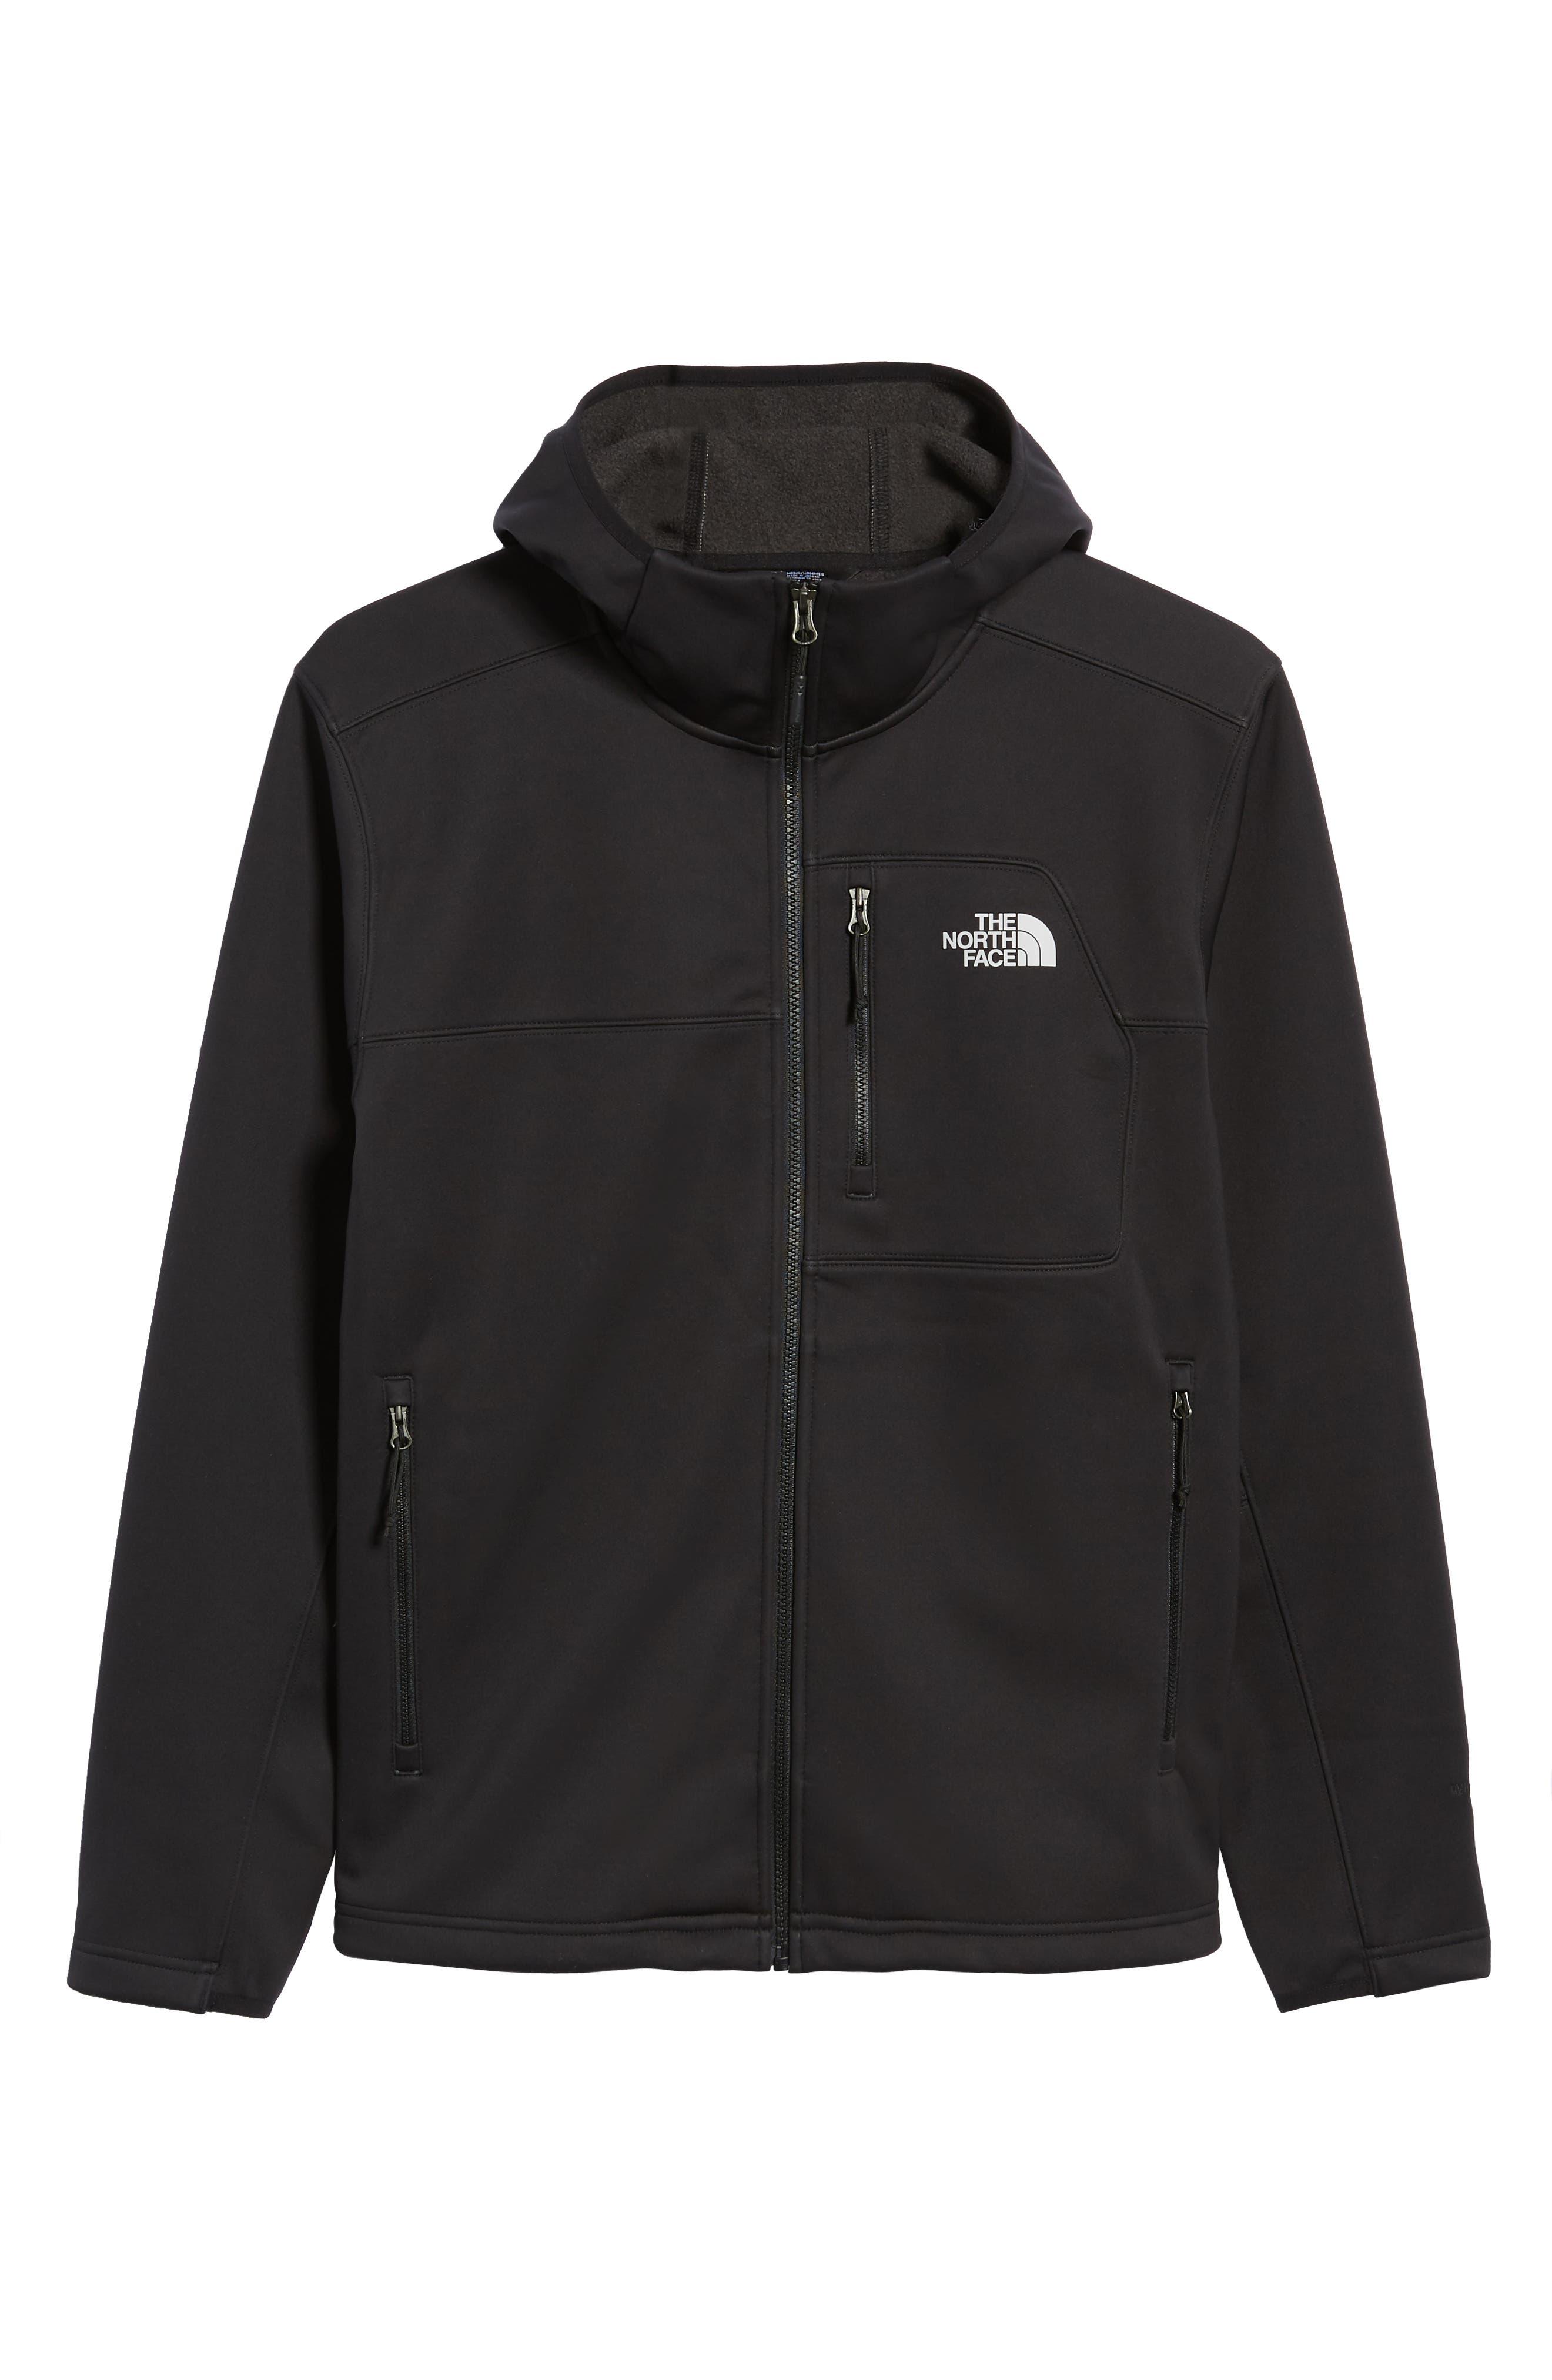 THE NORTH FACE,                             North Face Apex Risor Hooded Jacket,                             Alternate thumbnail 7, color,                             TNF BLACK/ TNF BLACK